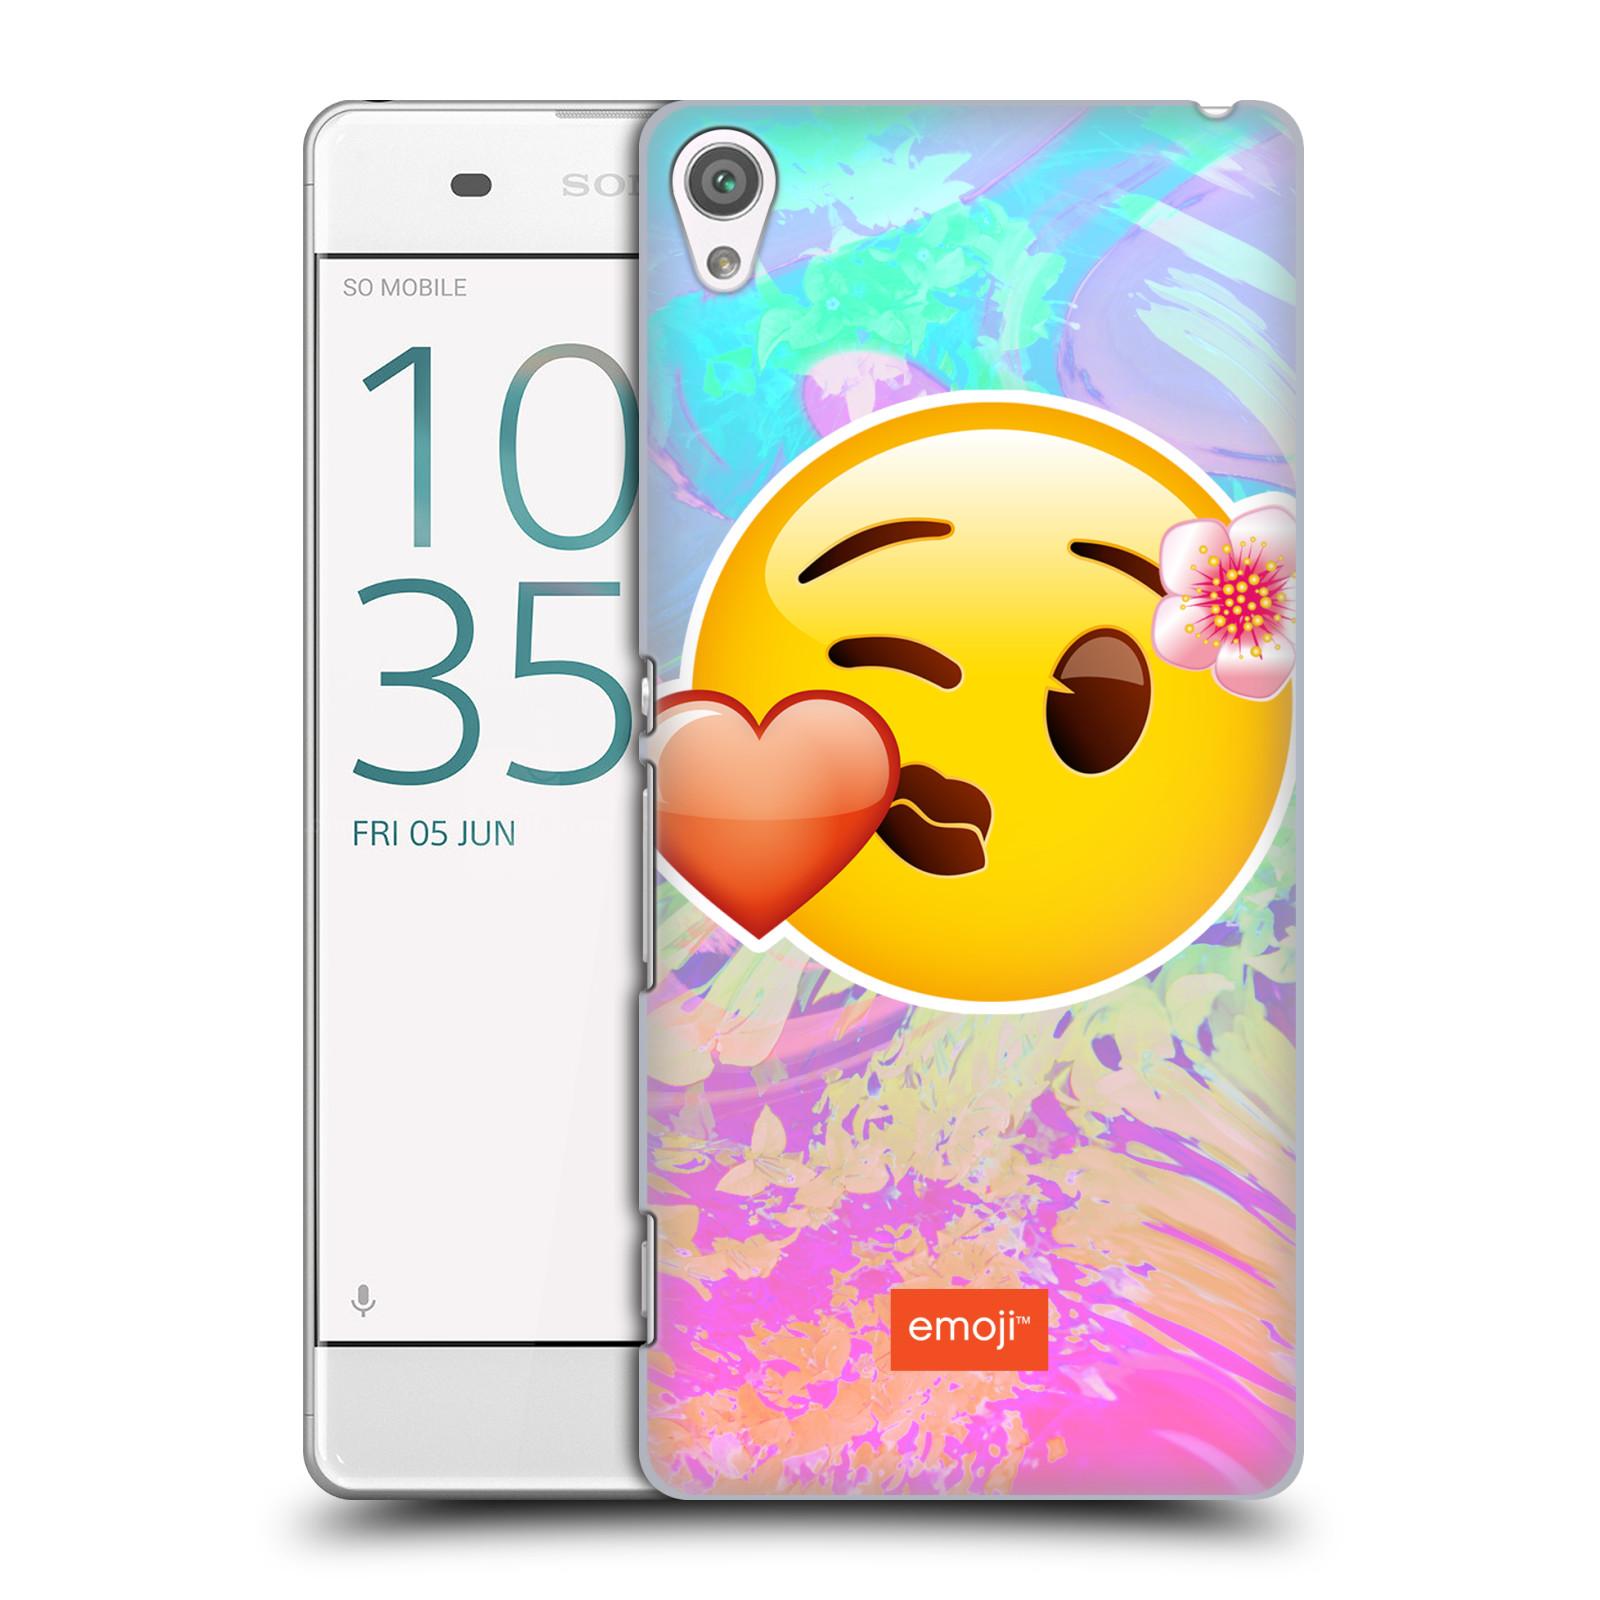 Pouzdro na mobil Sony Xperia XA - HEAD CASE - Emoji smajlík pusinka